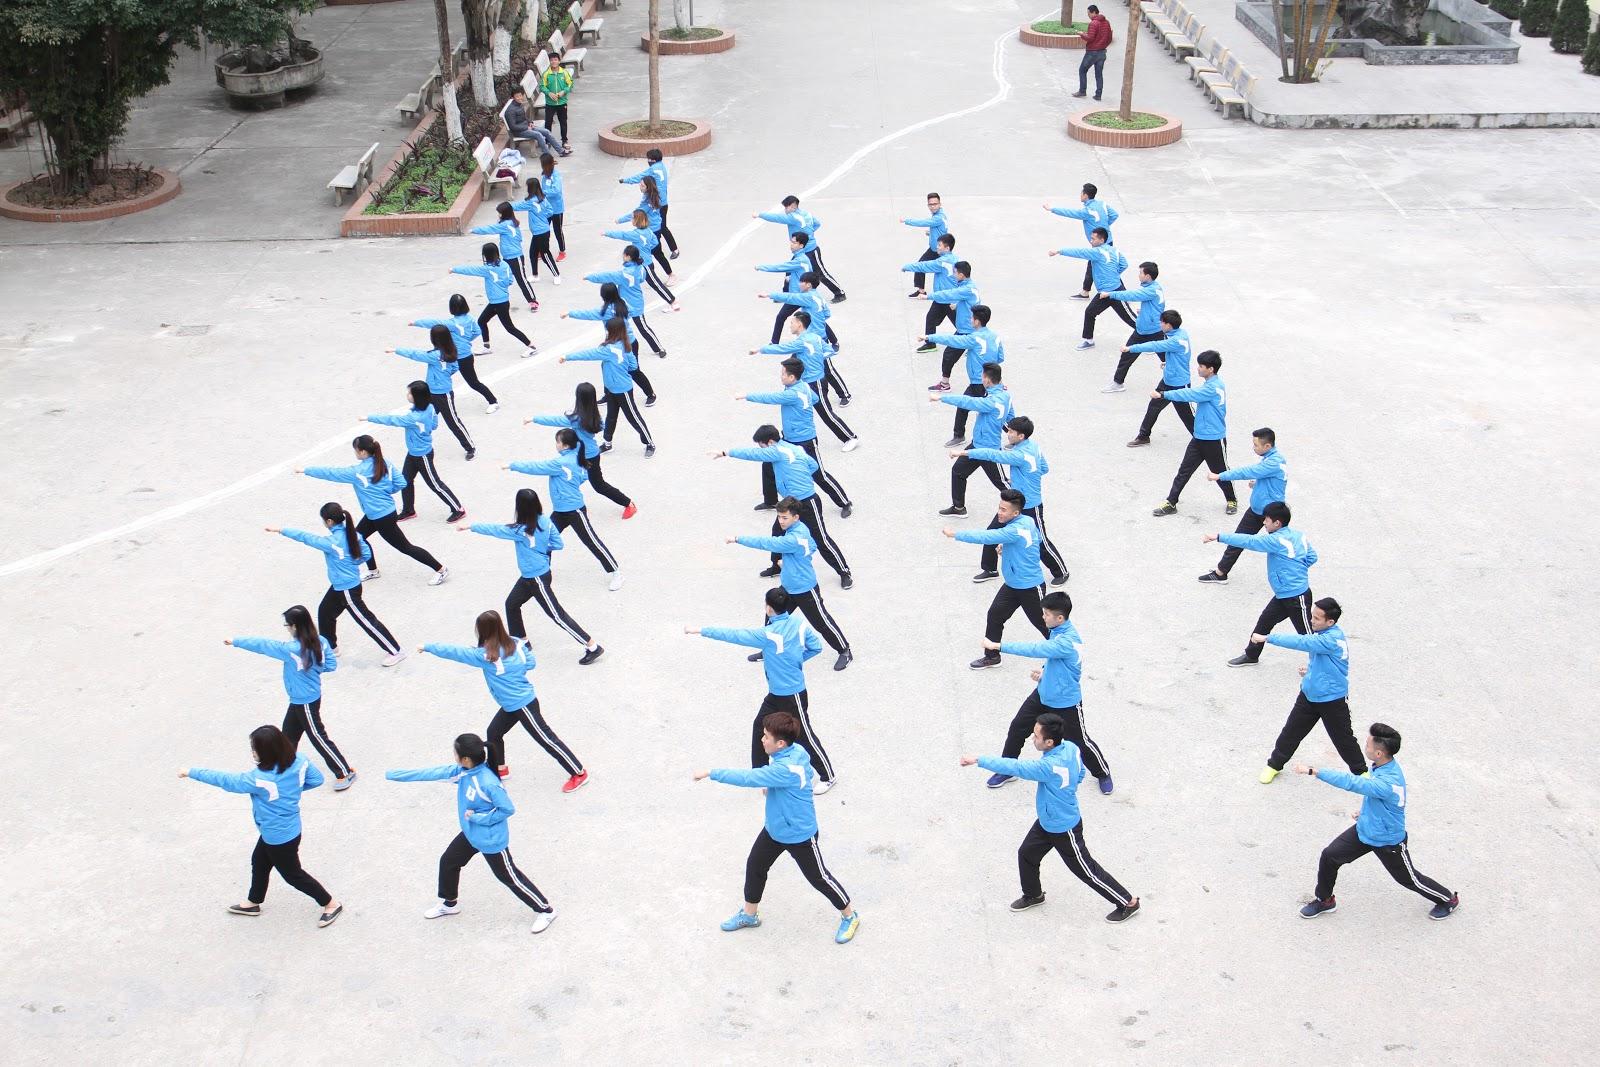 truong-doanh-nhan-ceo-viet-nam-co-so-mien-nam